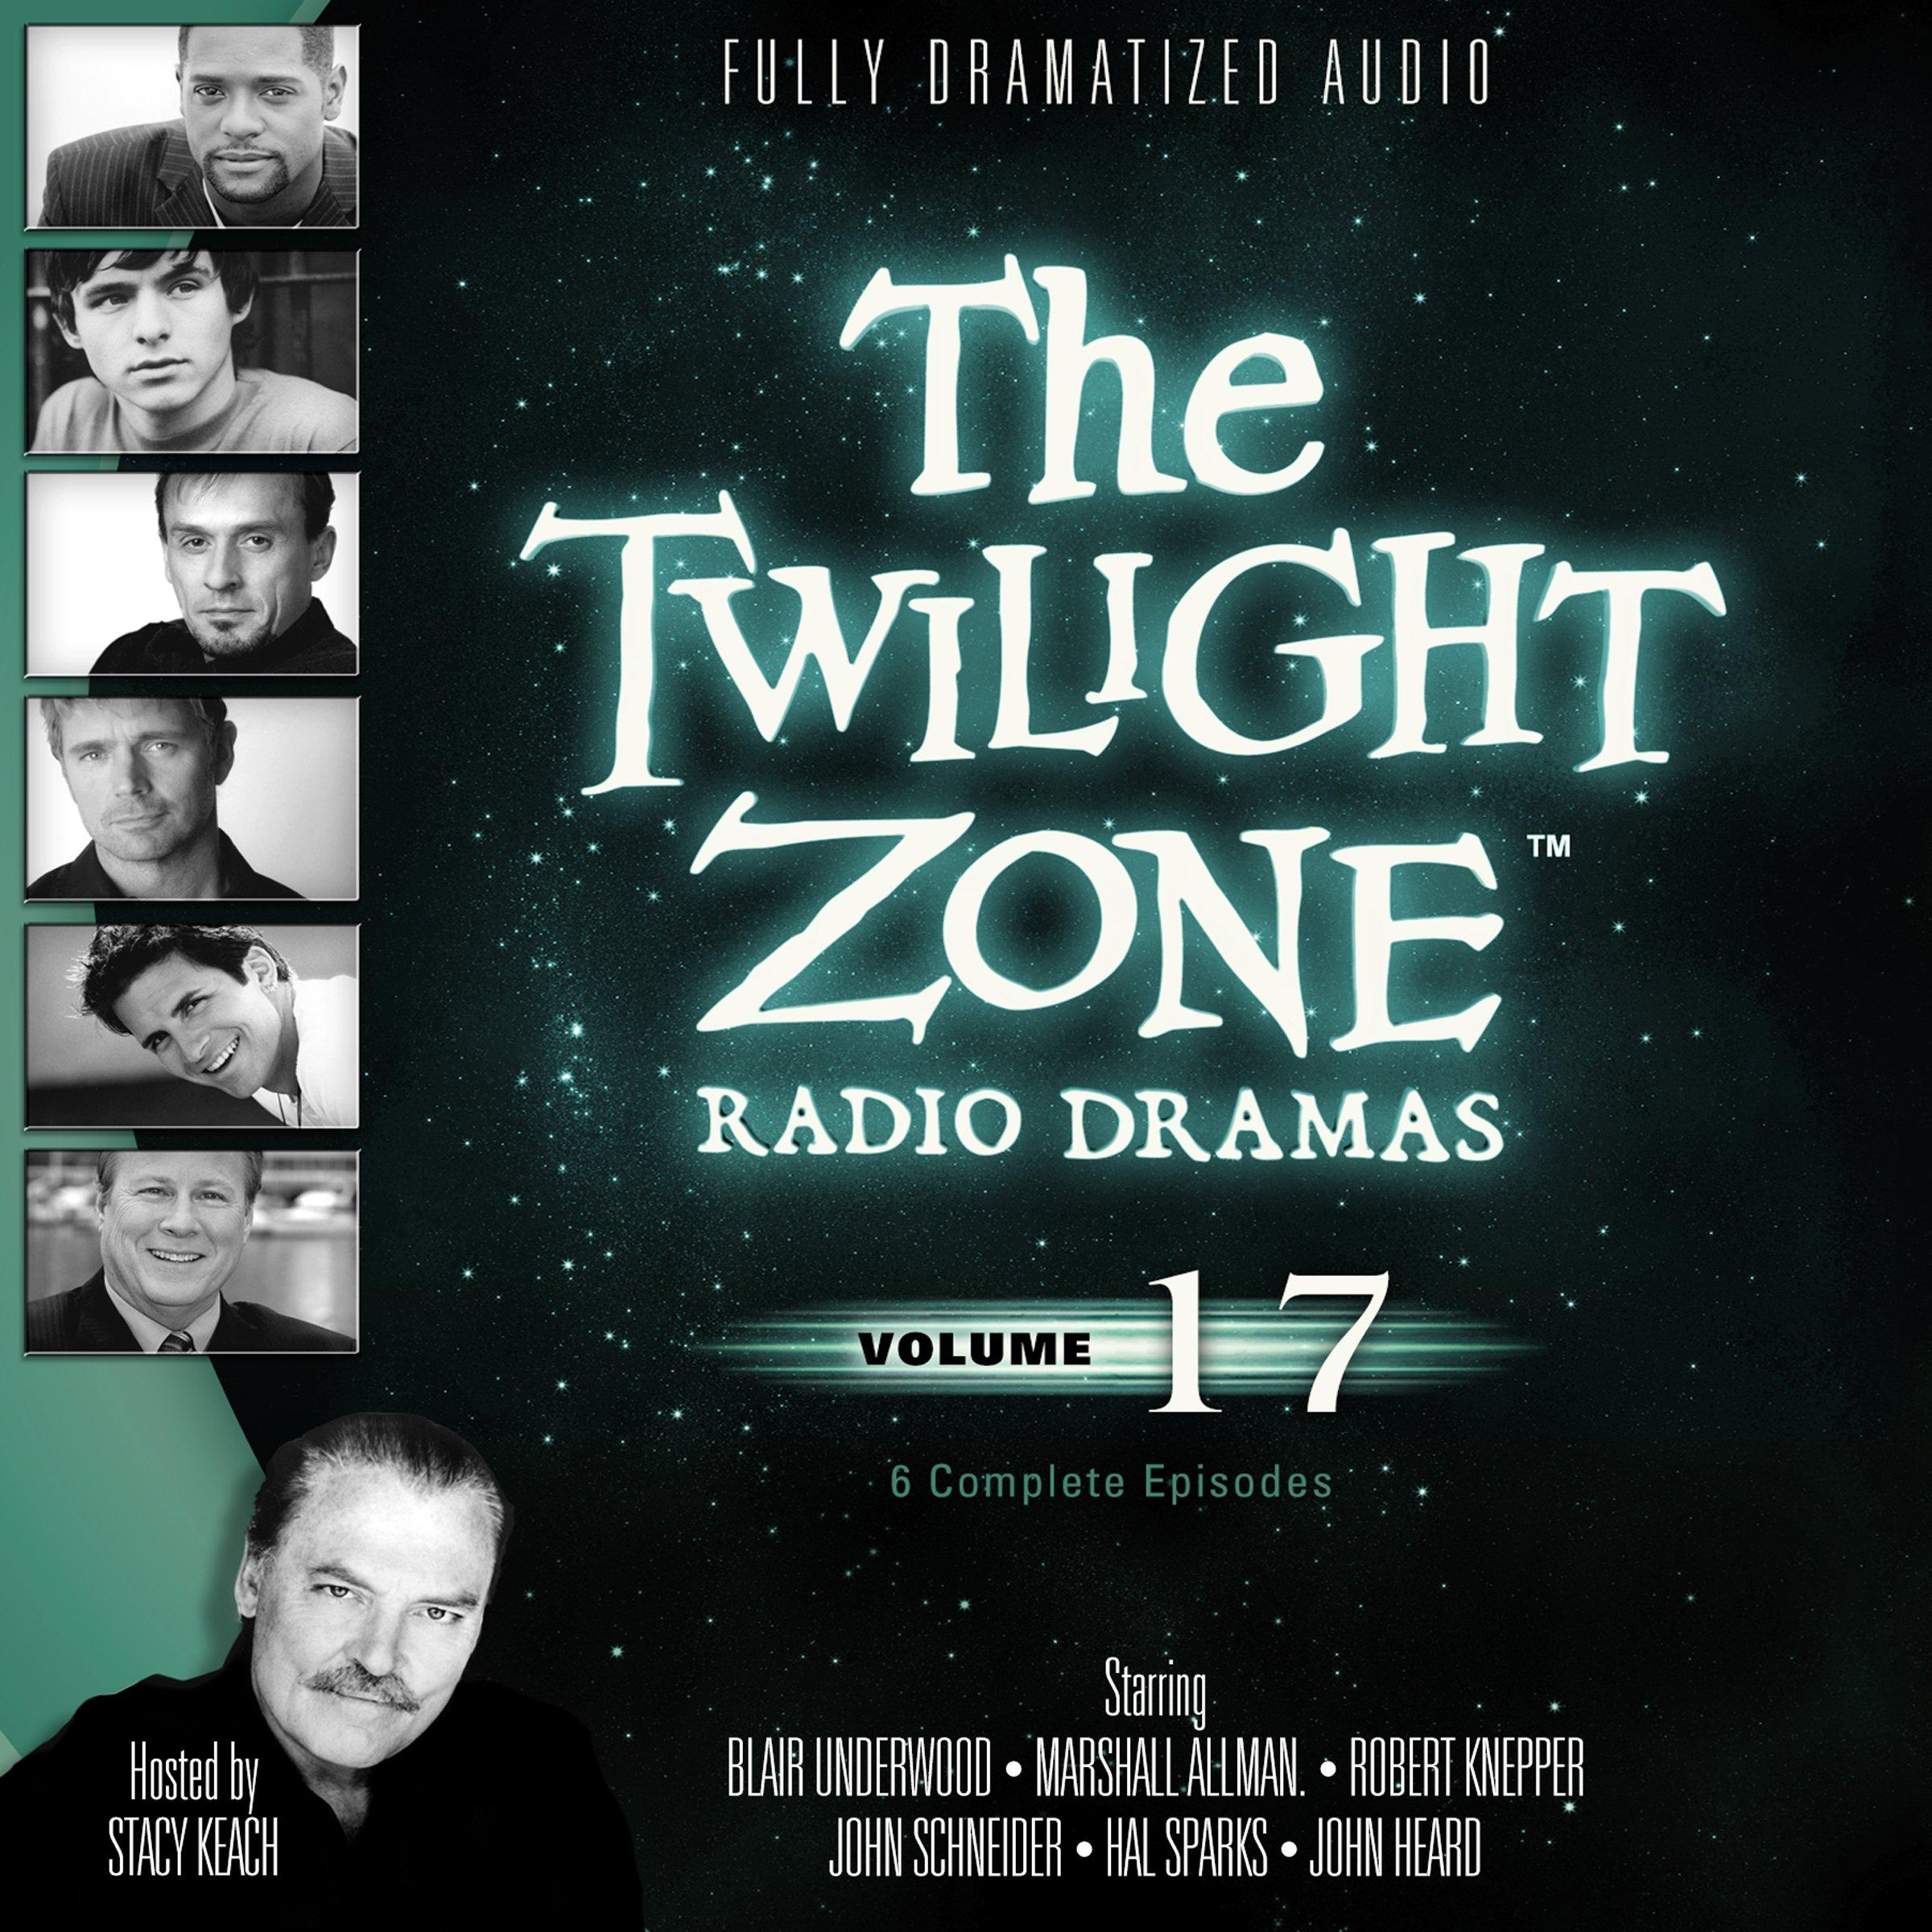 The Twilight Zone Radio Dramas, Volume 17 (Fully Dramatized Audio Theater hosted by Stacy Keach) pdf